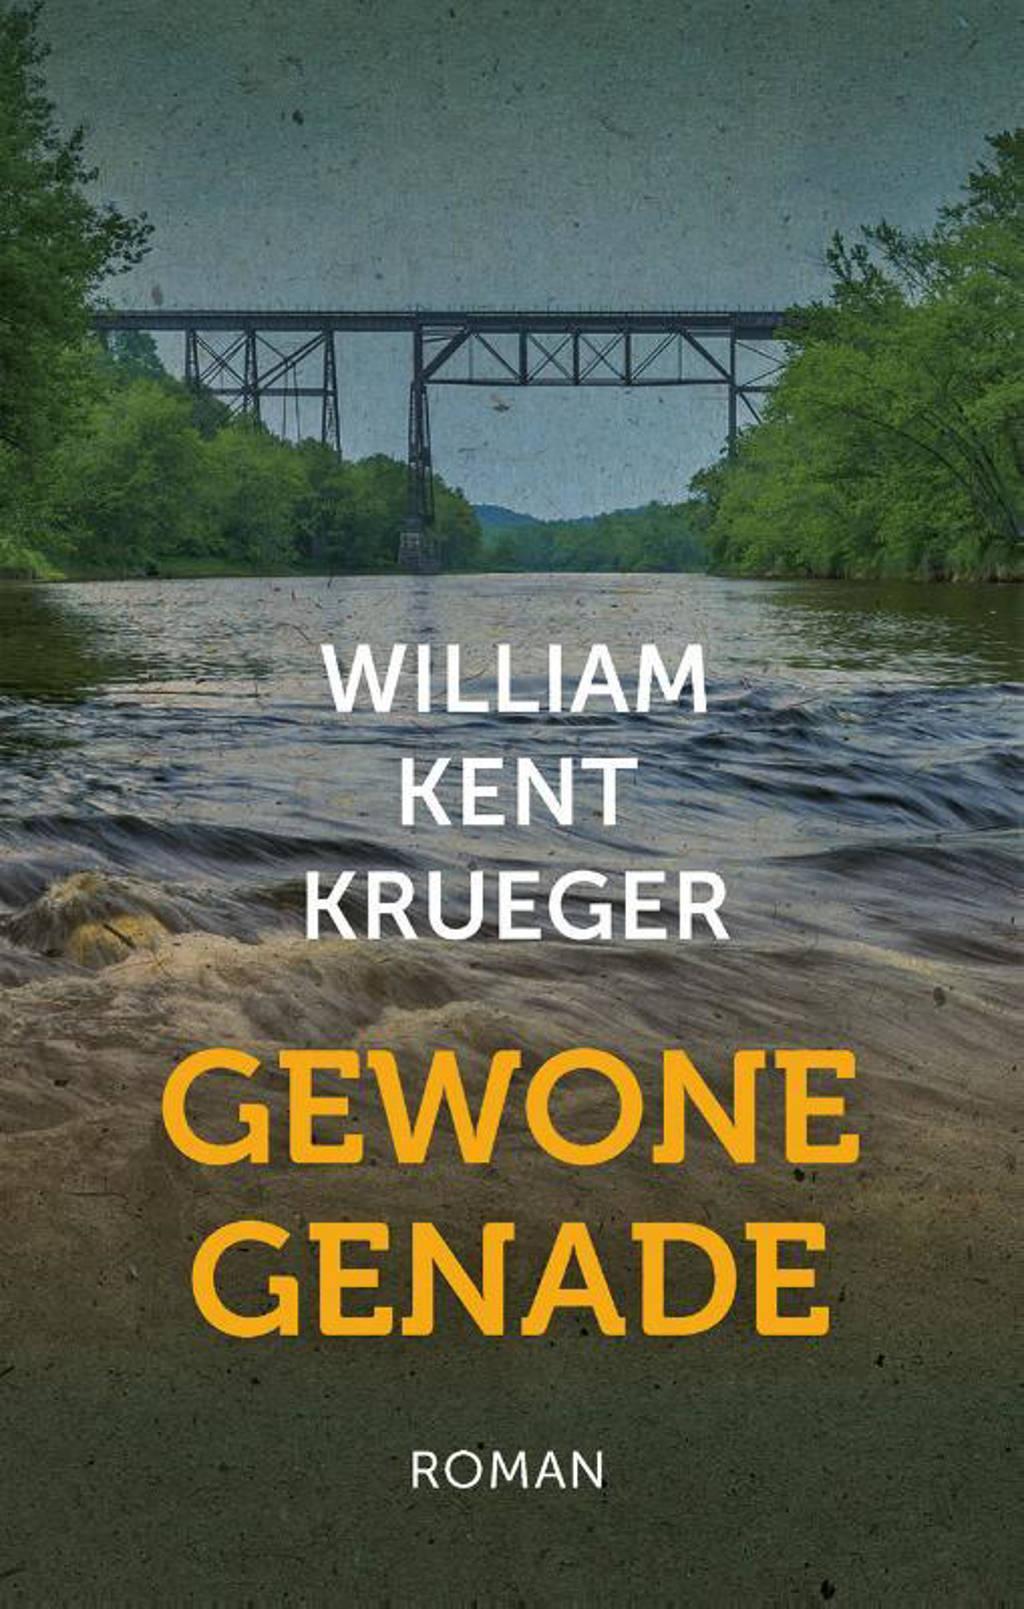 Gewone genade - William Kent Krueger